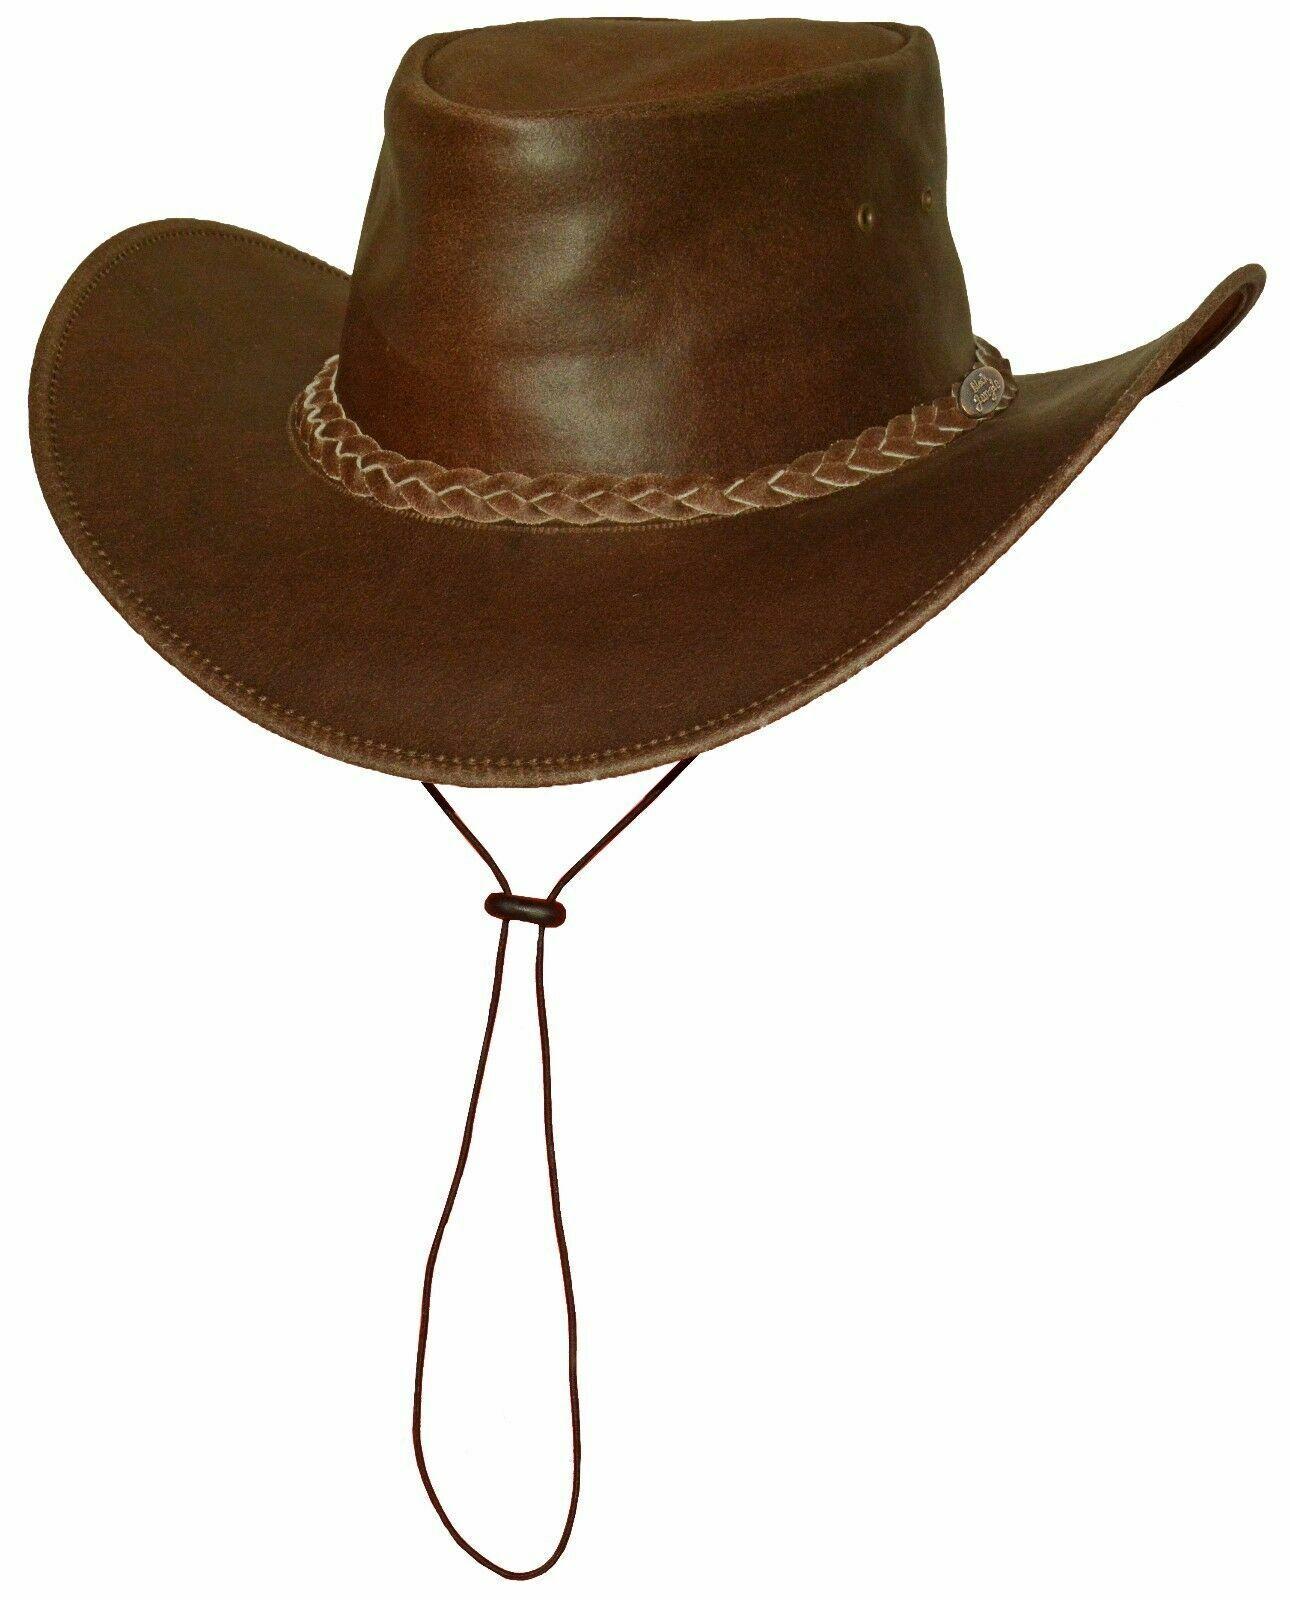 BROOME AUSTRALIA Style Lederhut Hat Western freizeithut Sun Hat Cowboy Hat Brau